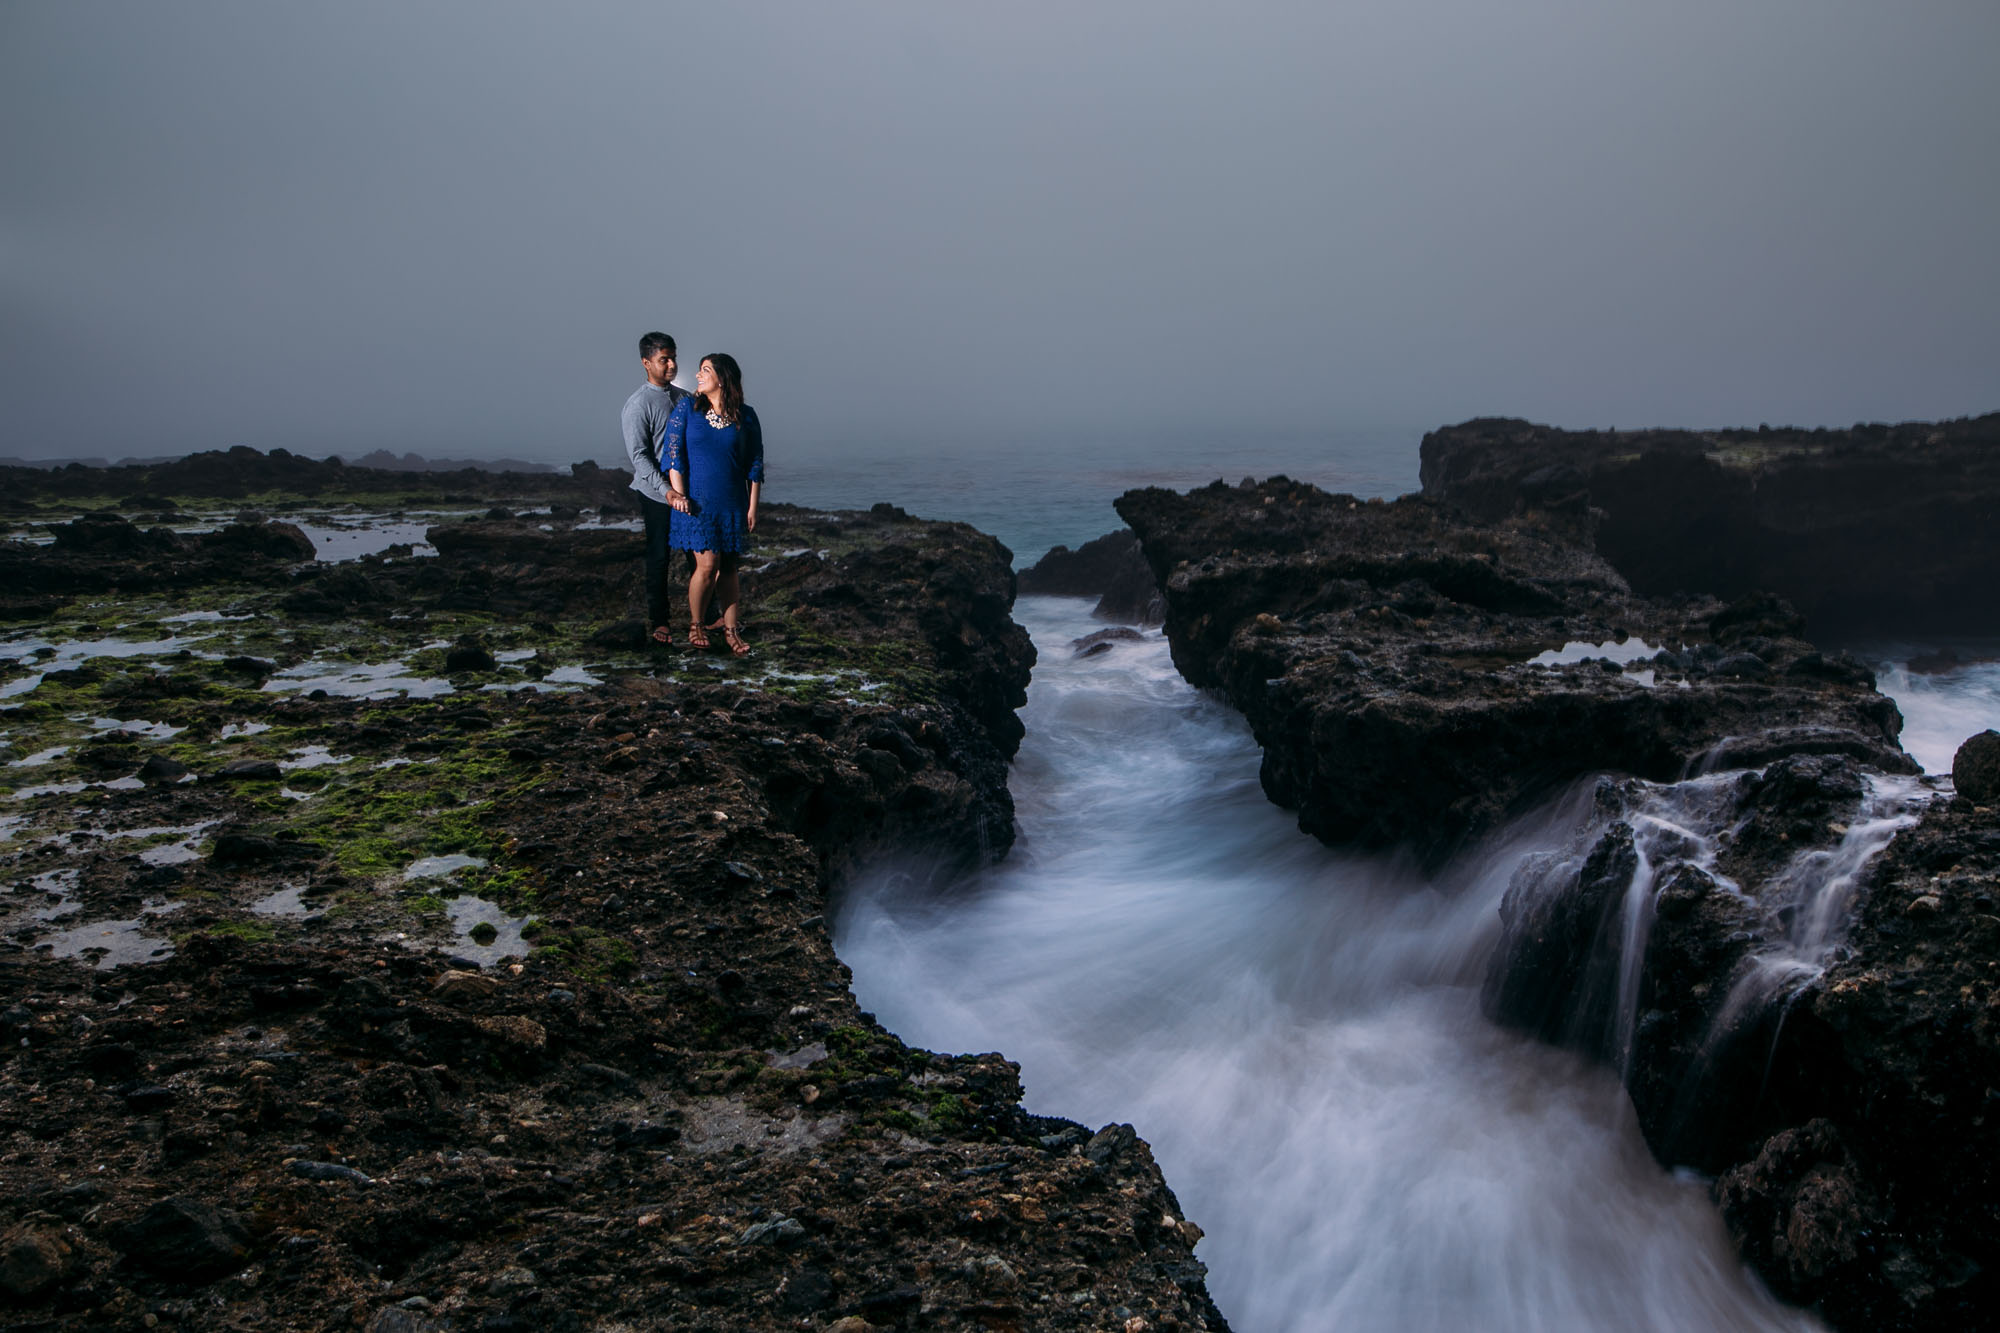 DS-Laguna-Beach-Engagement-Photography-Sarah-Mack-Photo -0008.jpg